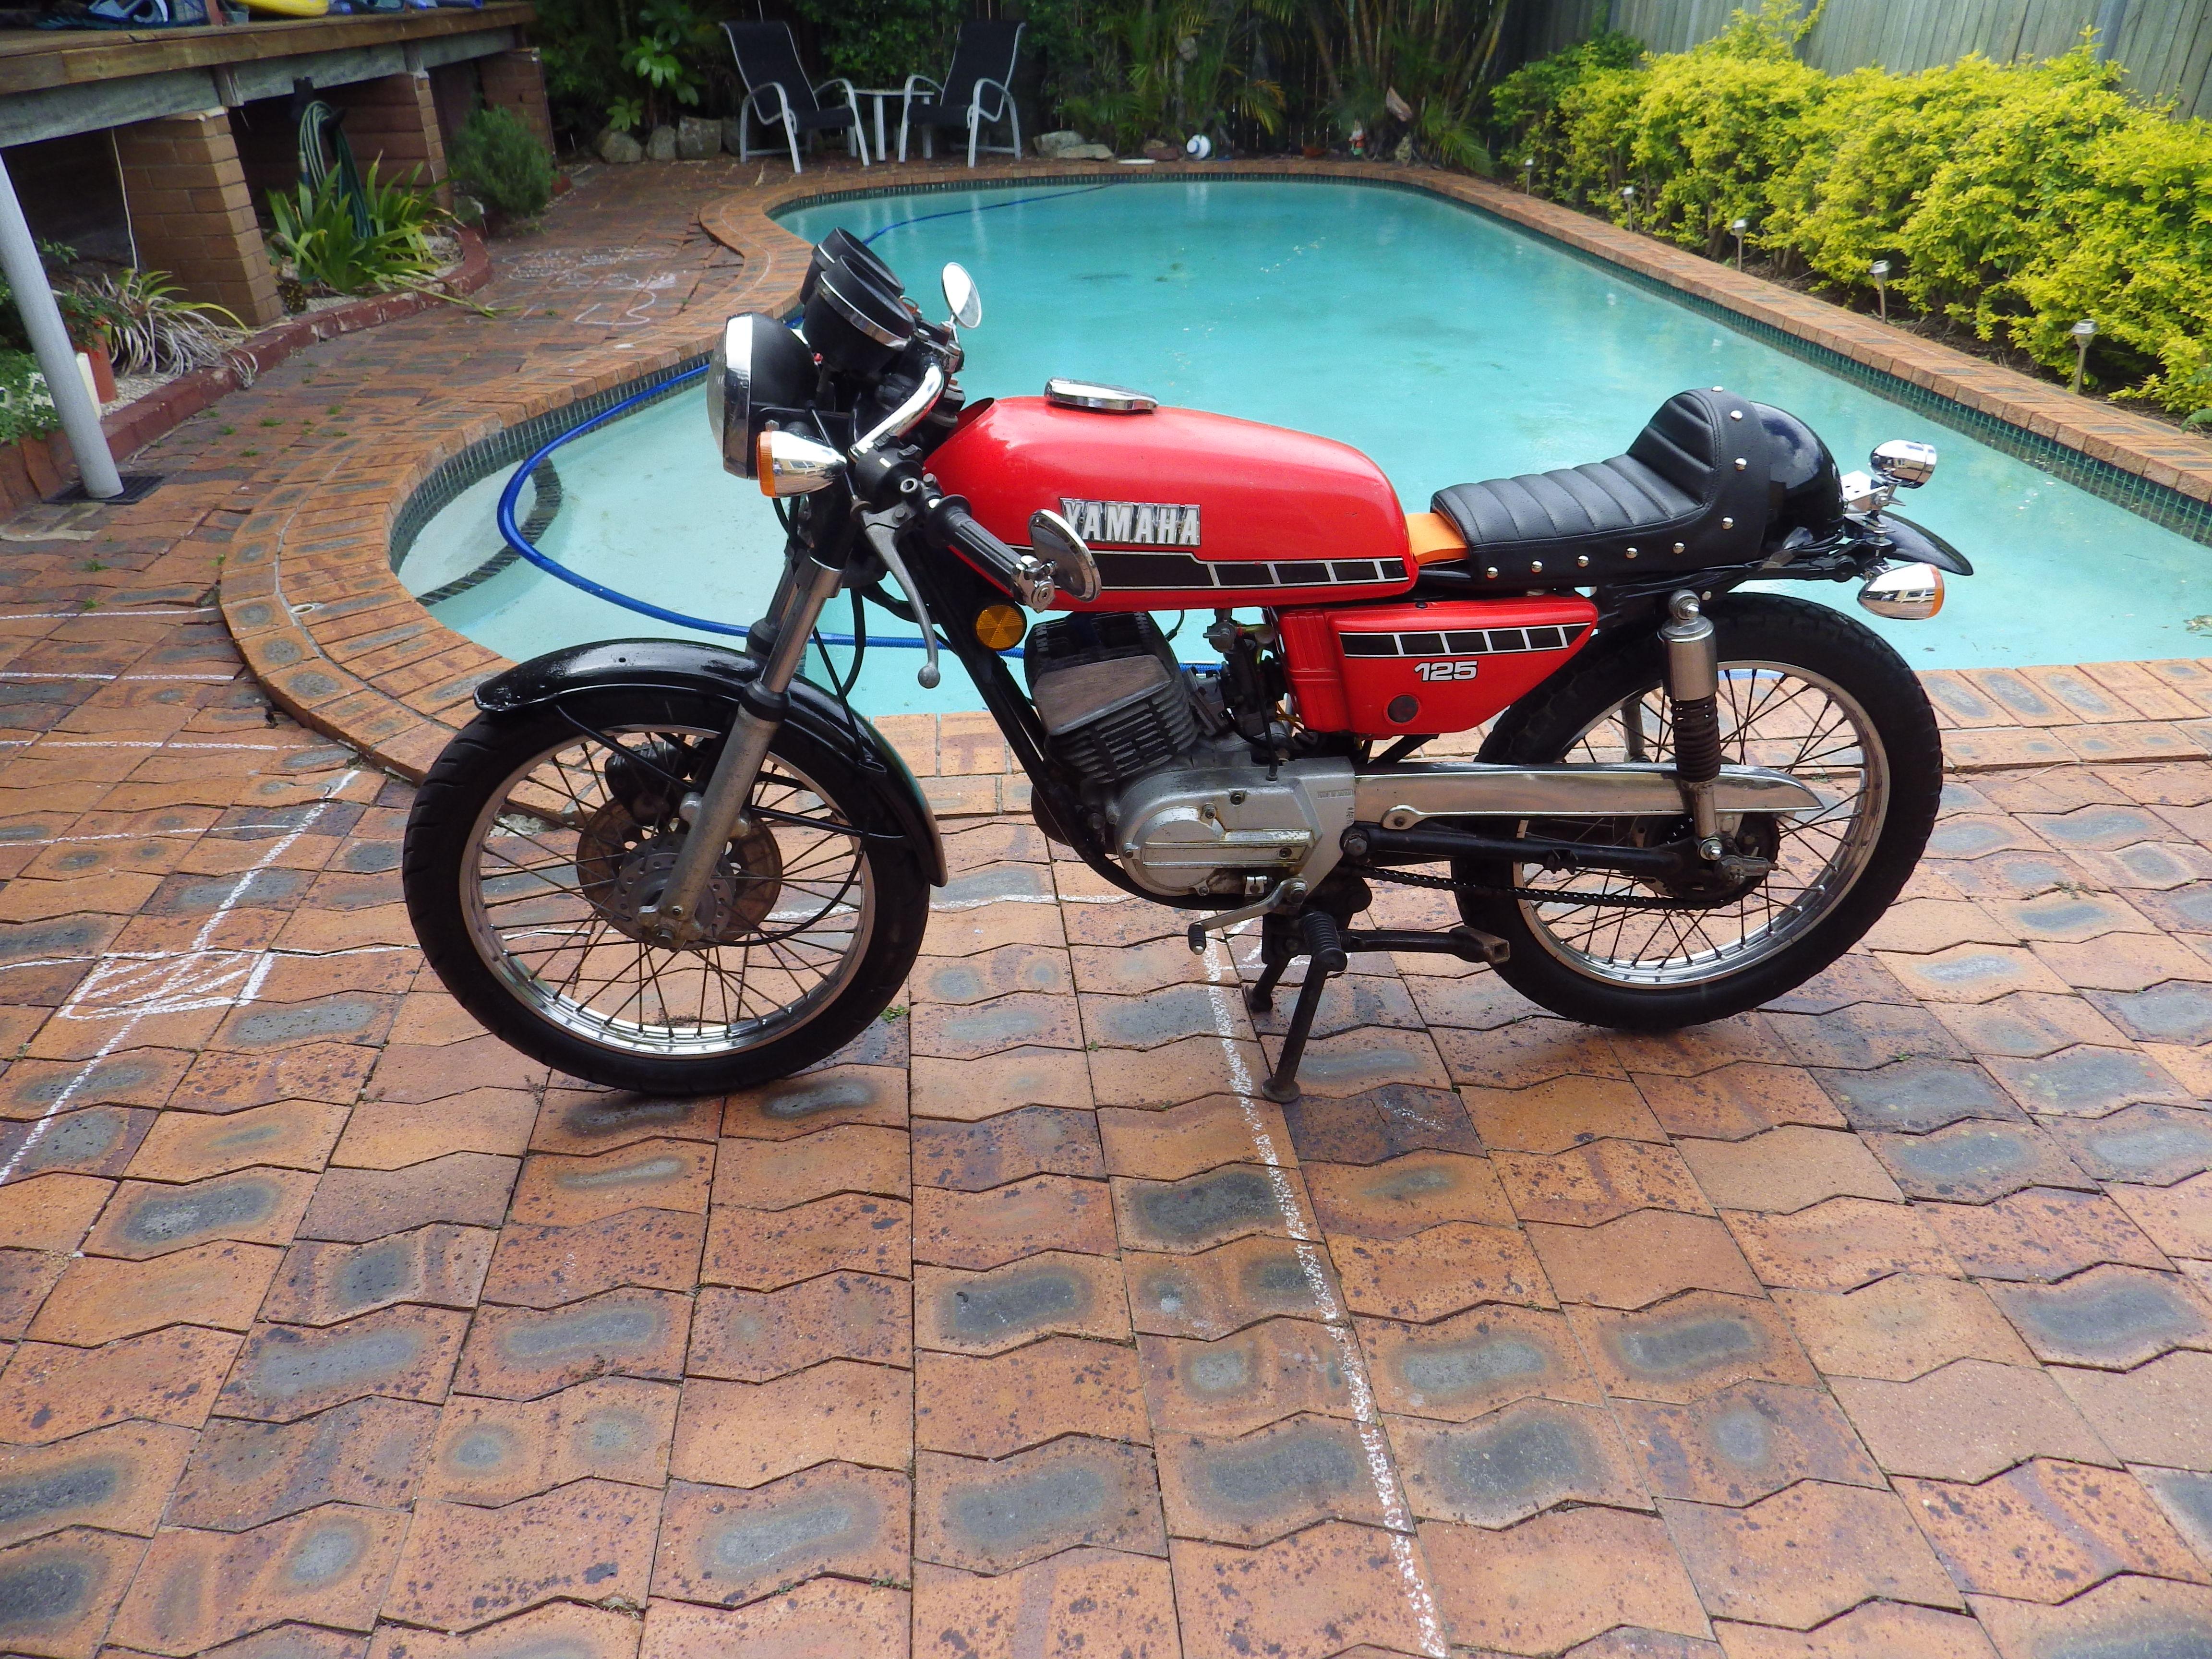 1978 yamaha rx125 bike sales qld gold coast 2905775